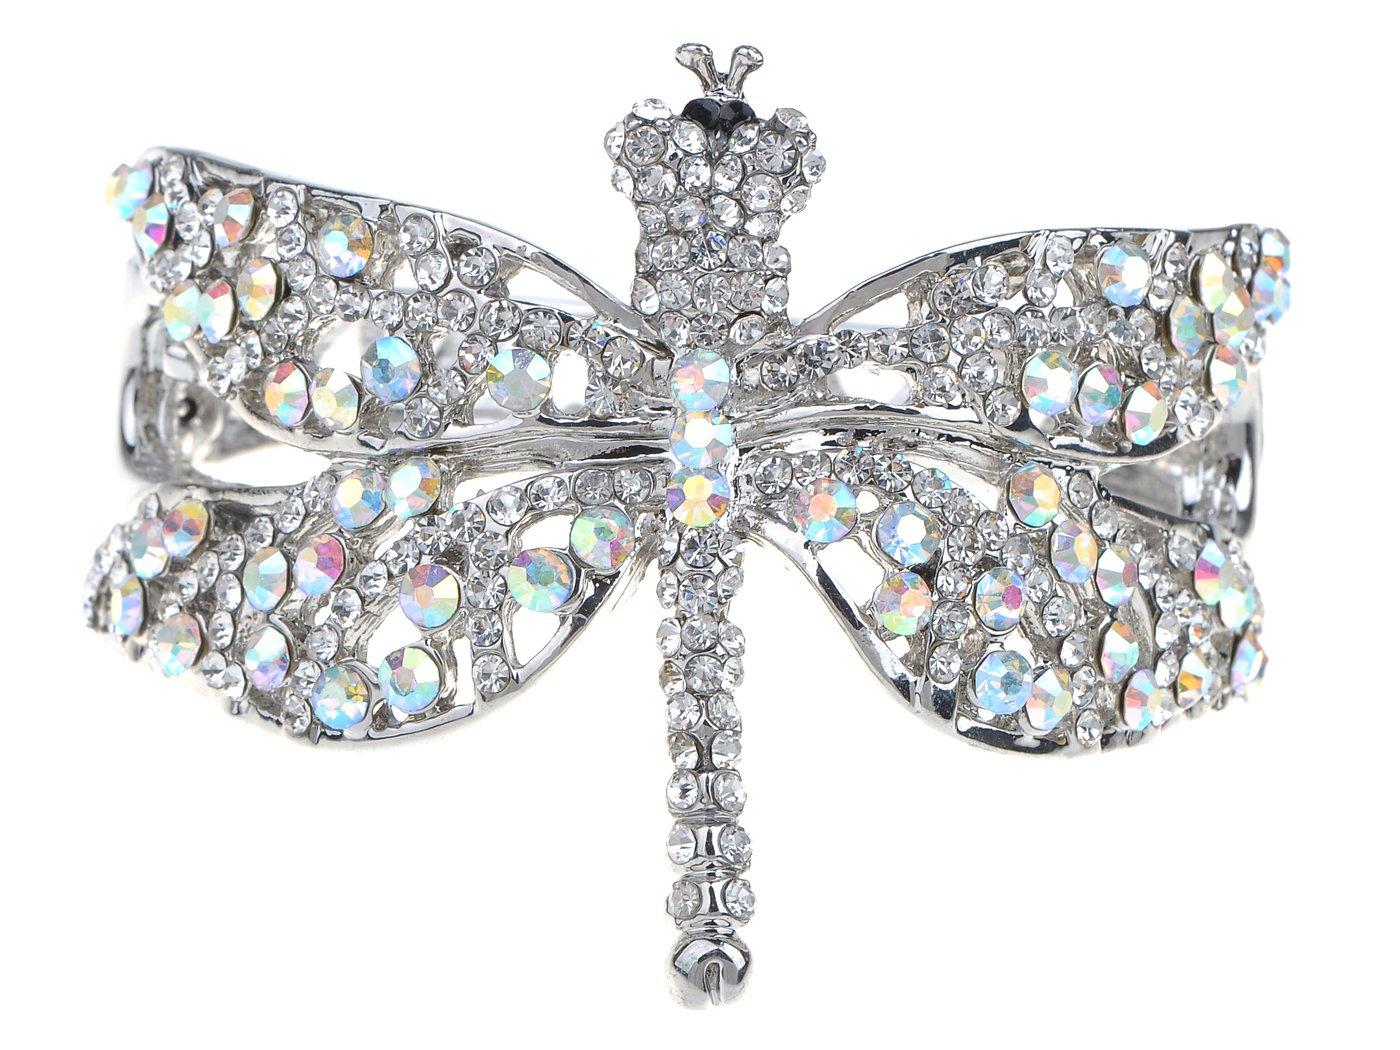 Alilang Womens Silvery Tone Clear Rhinestones Dragonfly Heart Cutout Bangle Bracelet by Alilang (Image #1)